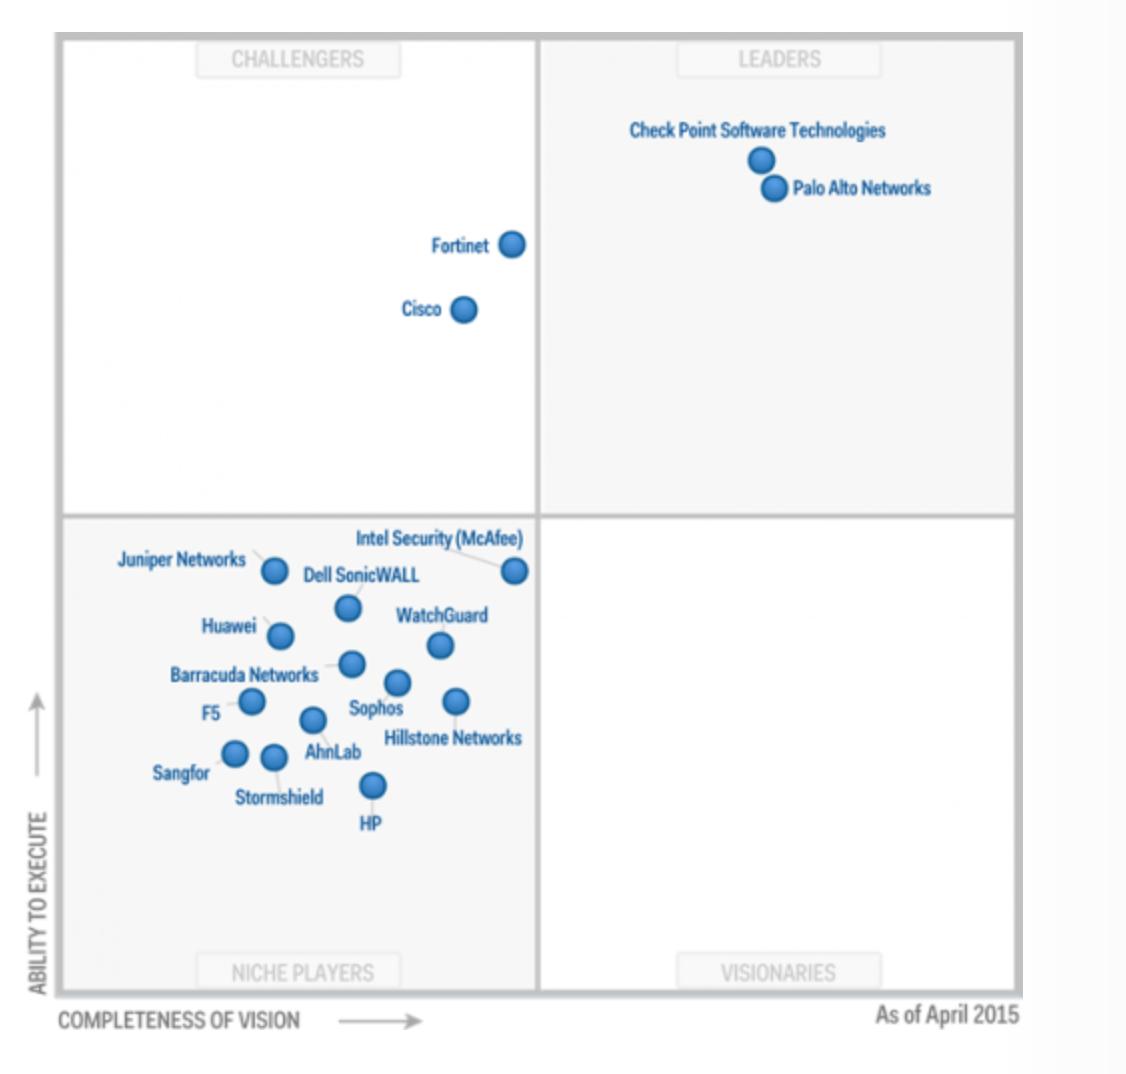 Palo Alto Leads The Gartner Magic Quadrant For Enterprise